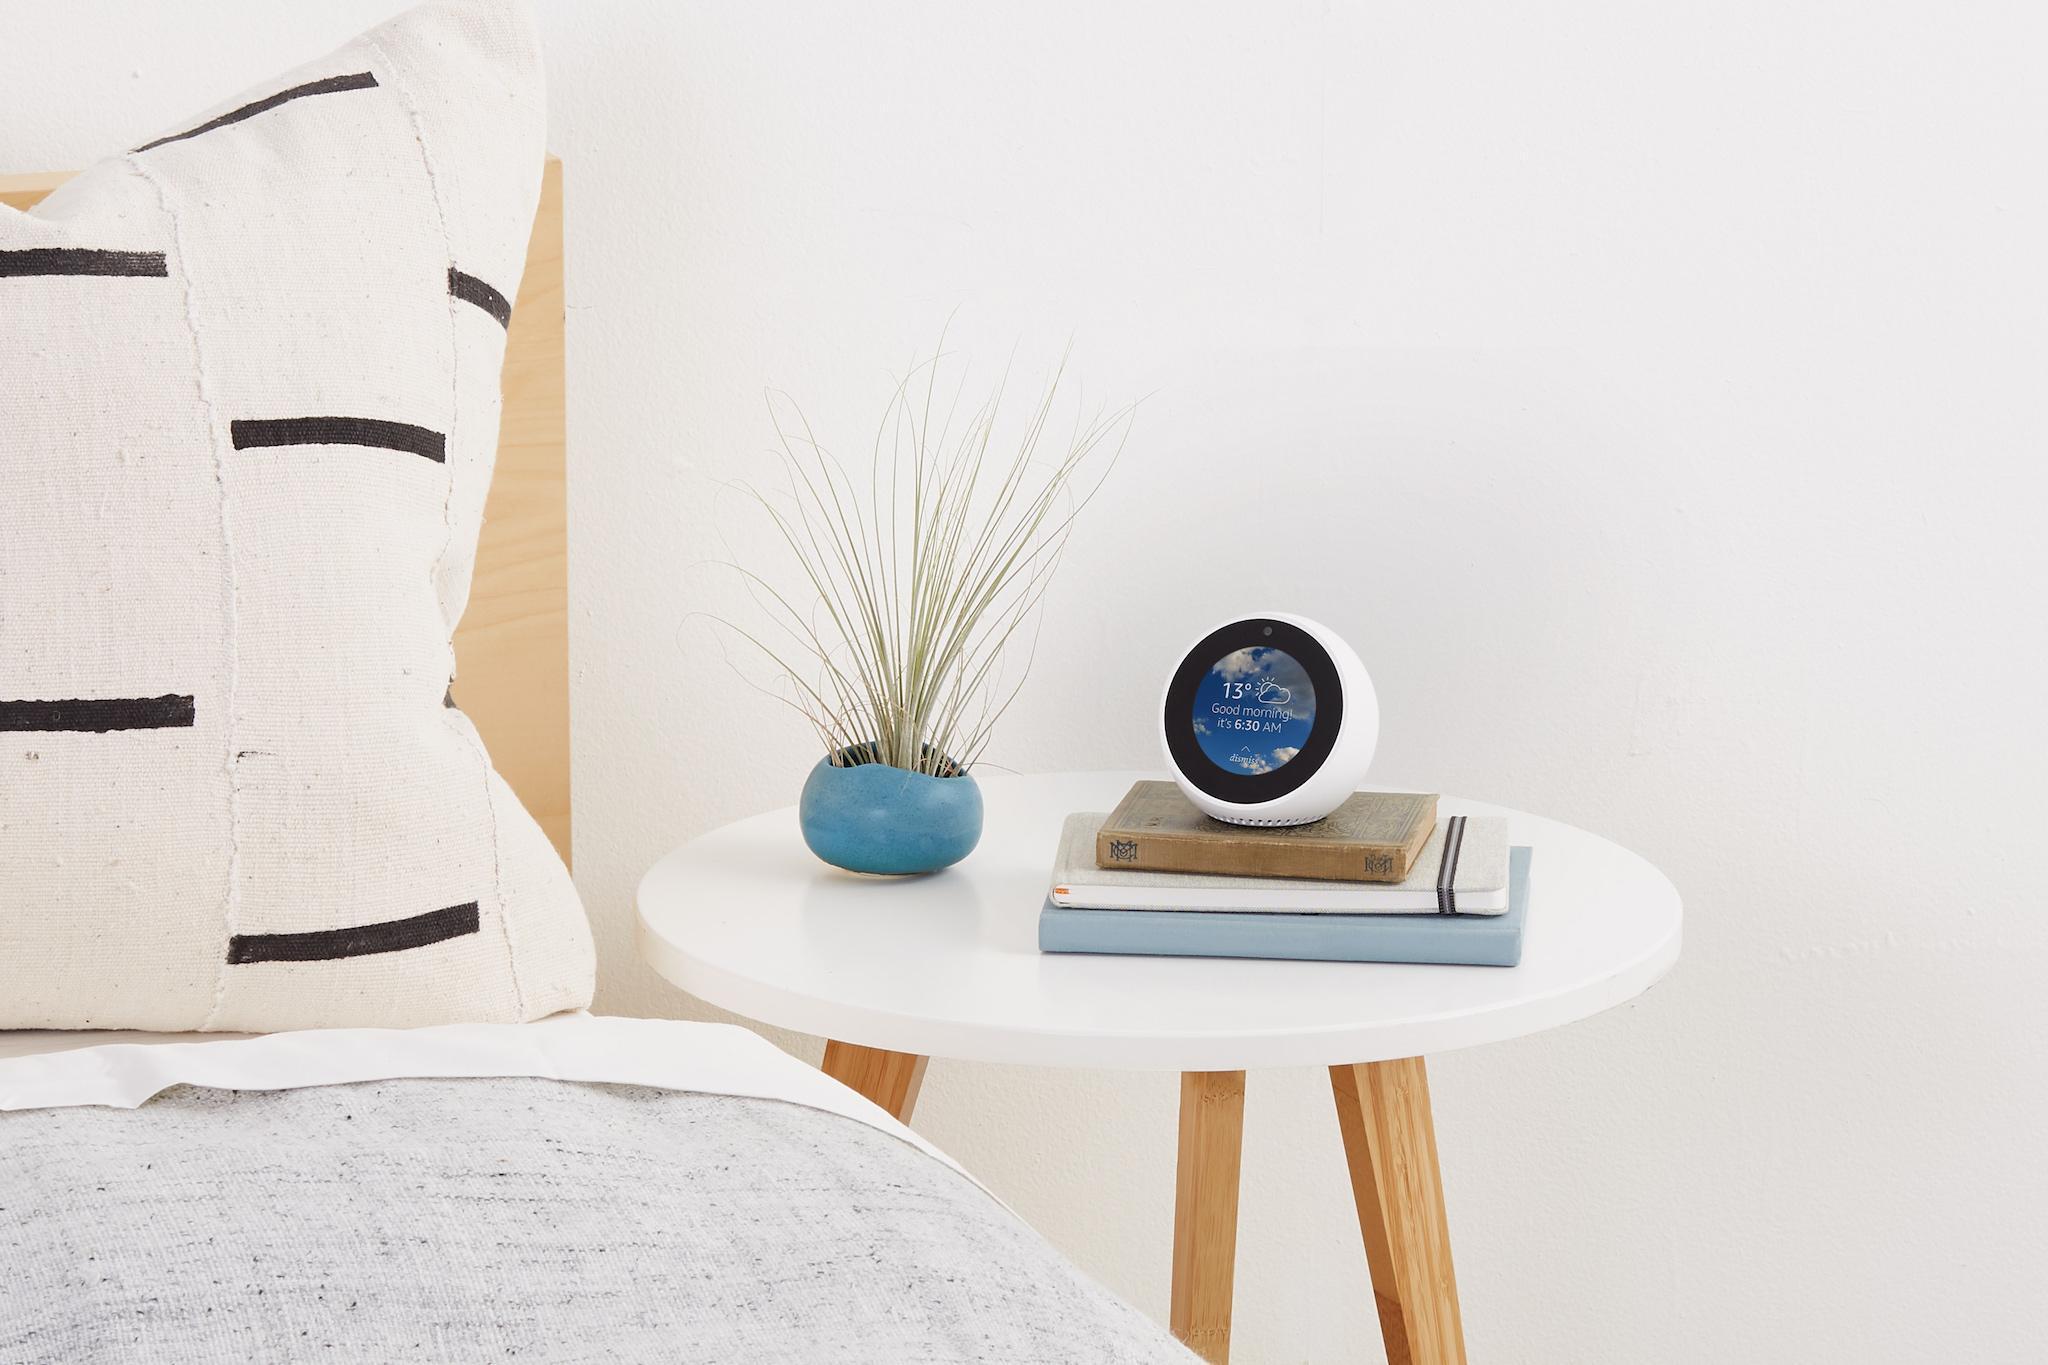 Amazon Echo Spot: Alexa comes to the bedroom as company reveals new smart alarm clock in UK